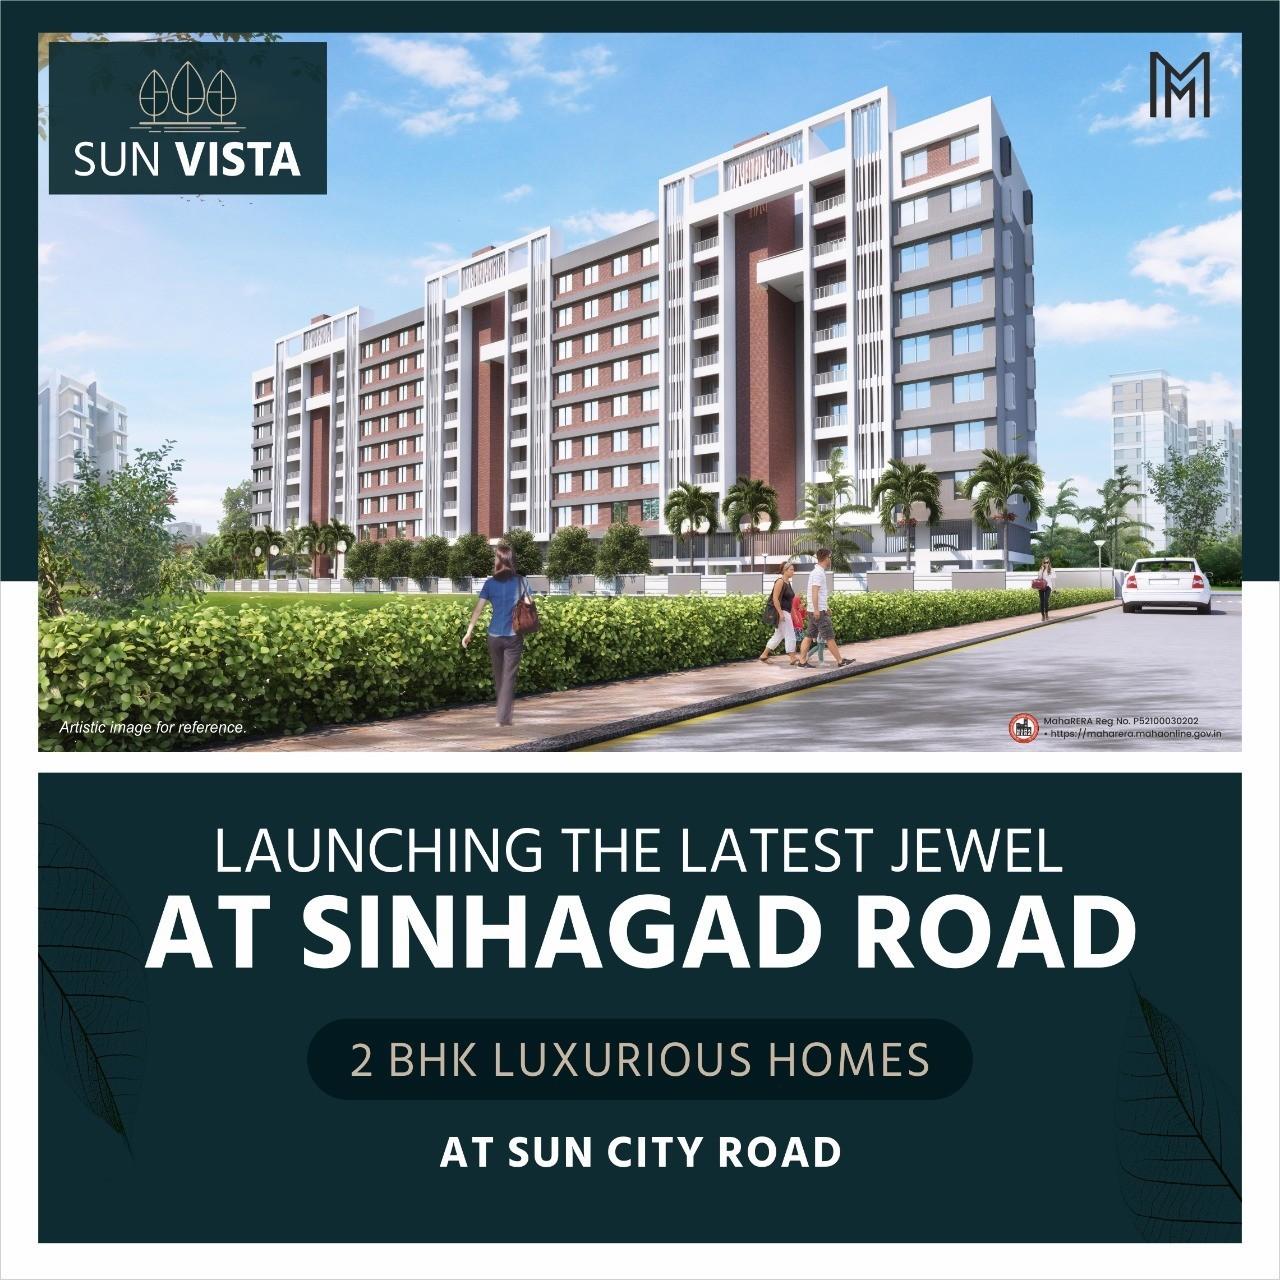 2 BHK Flats at Sun City Road | Sun Vista- Mittal Builders